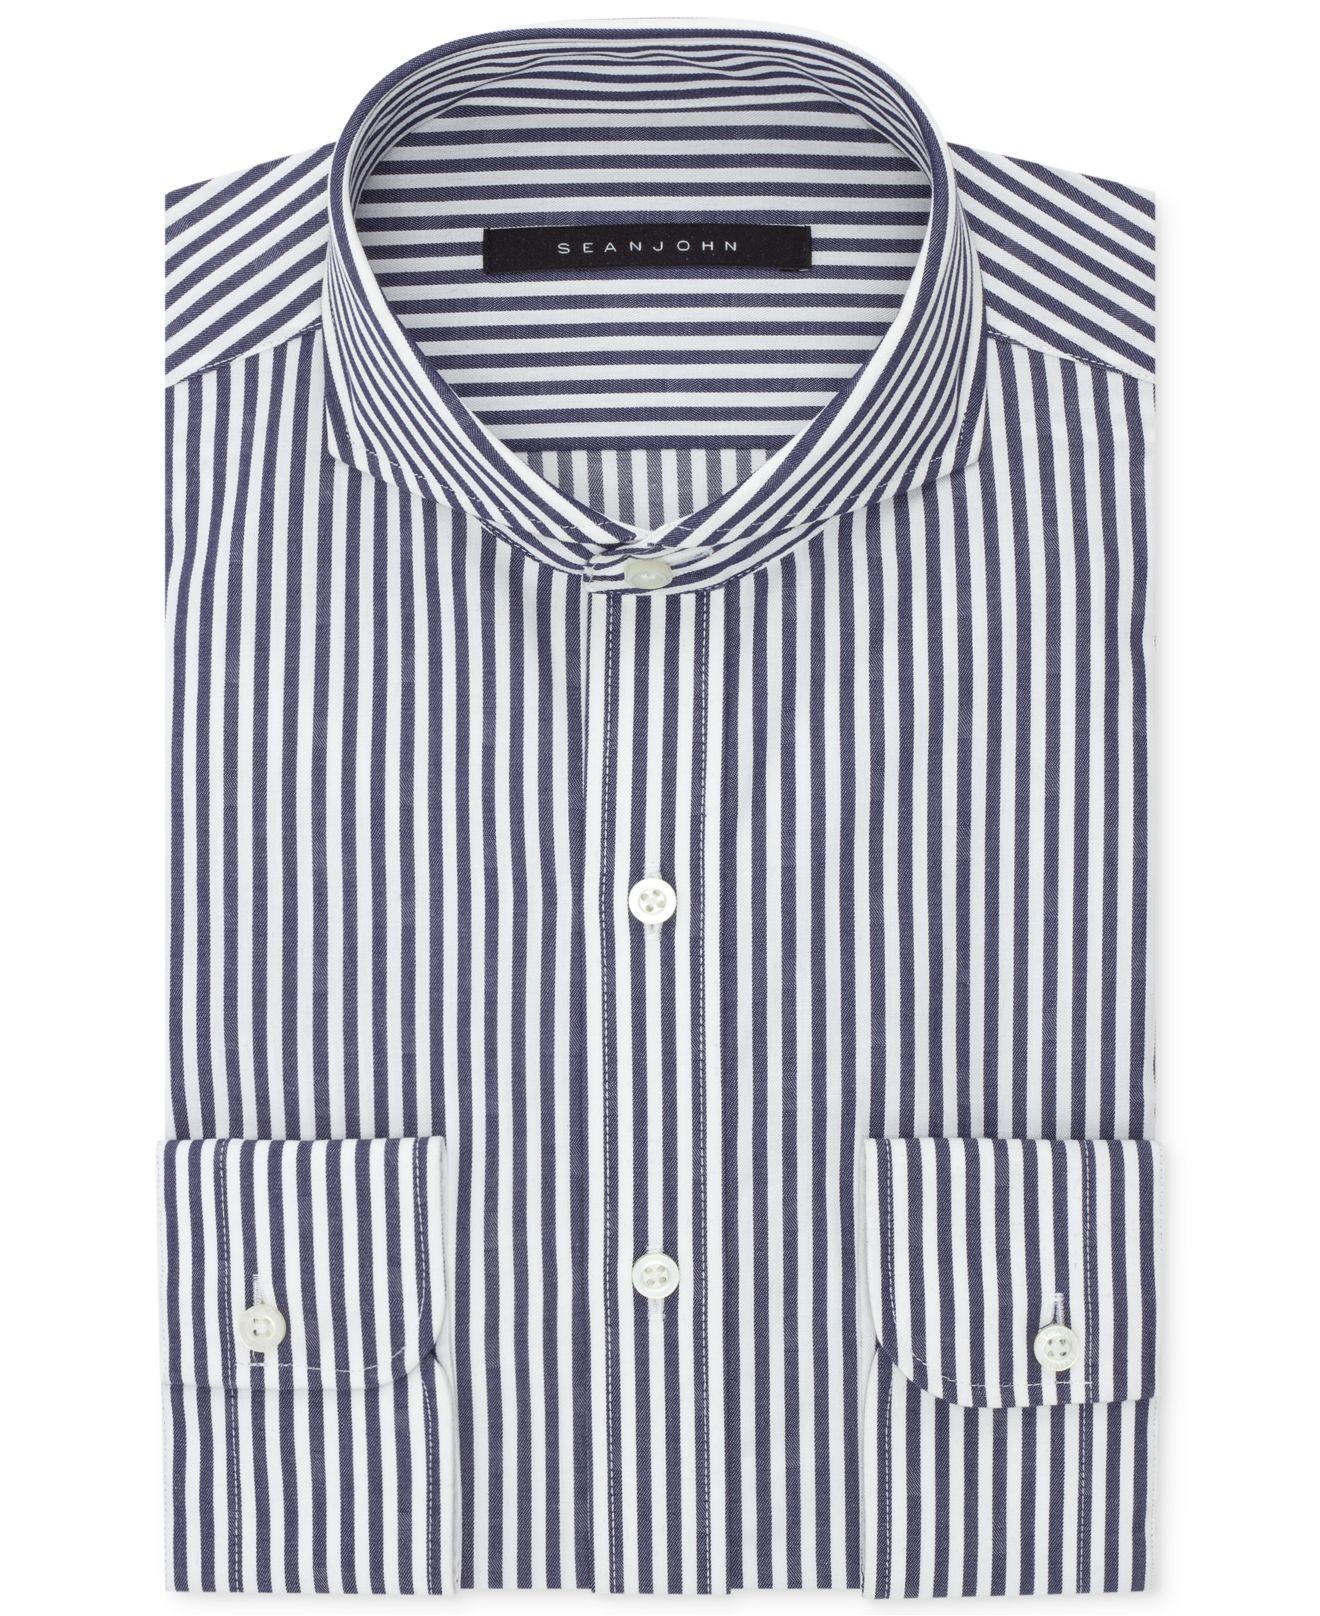 Lyst Sean John Midnight Blue Stripe Dress Shirt In Blue For Men